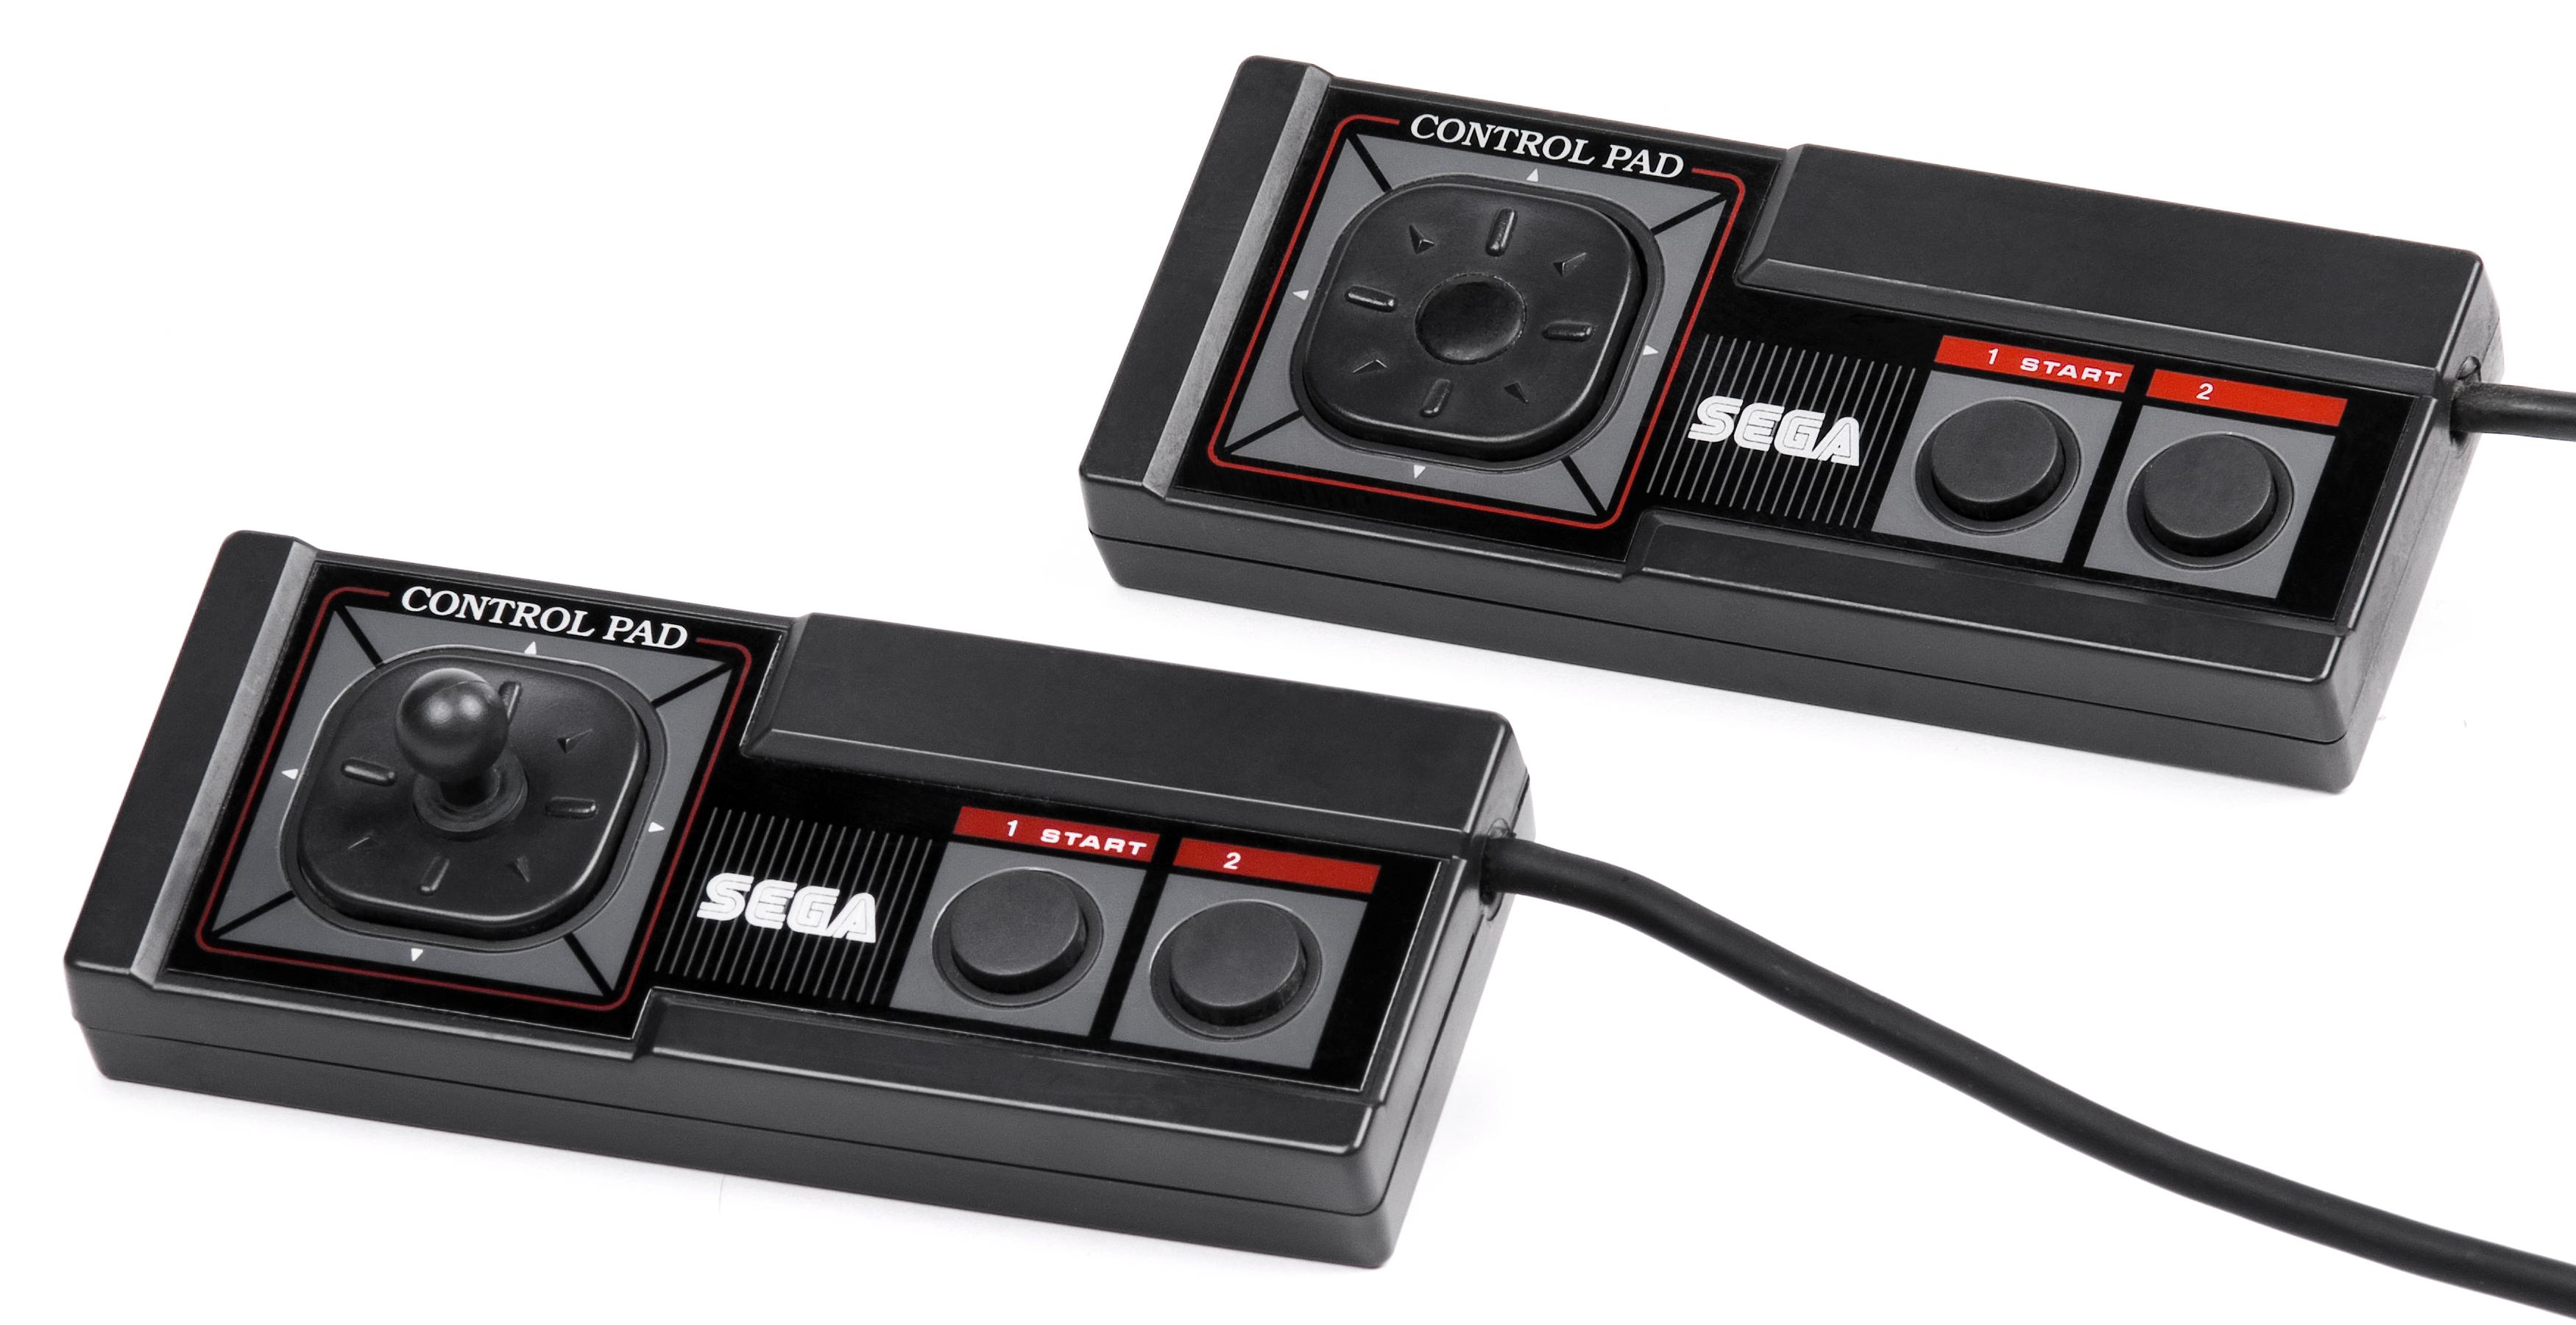 Sega-Master-System-Controllers.jpg